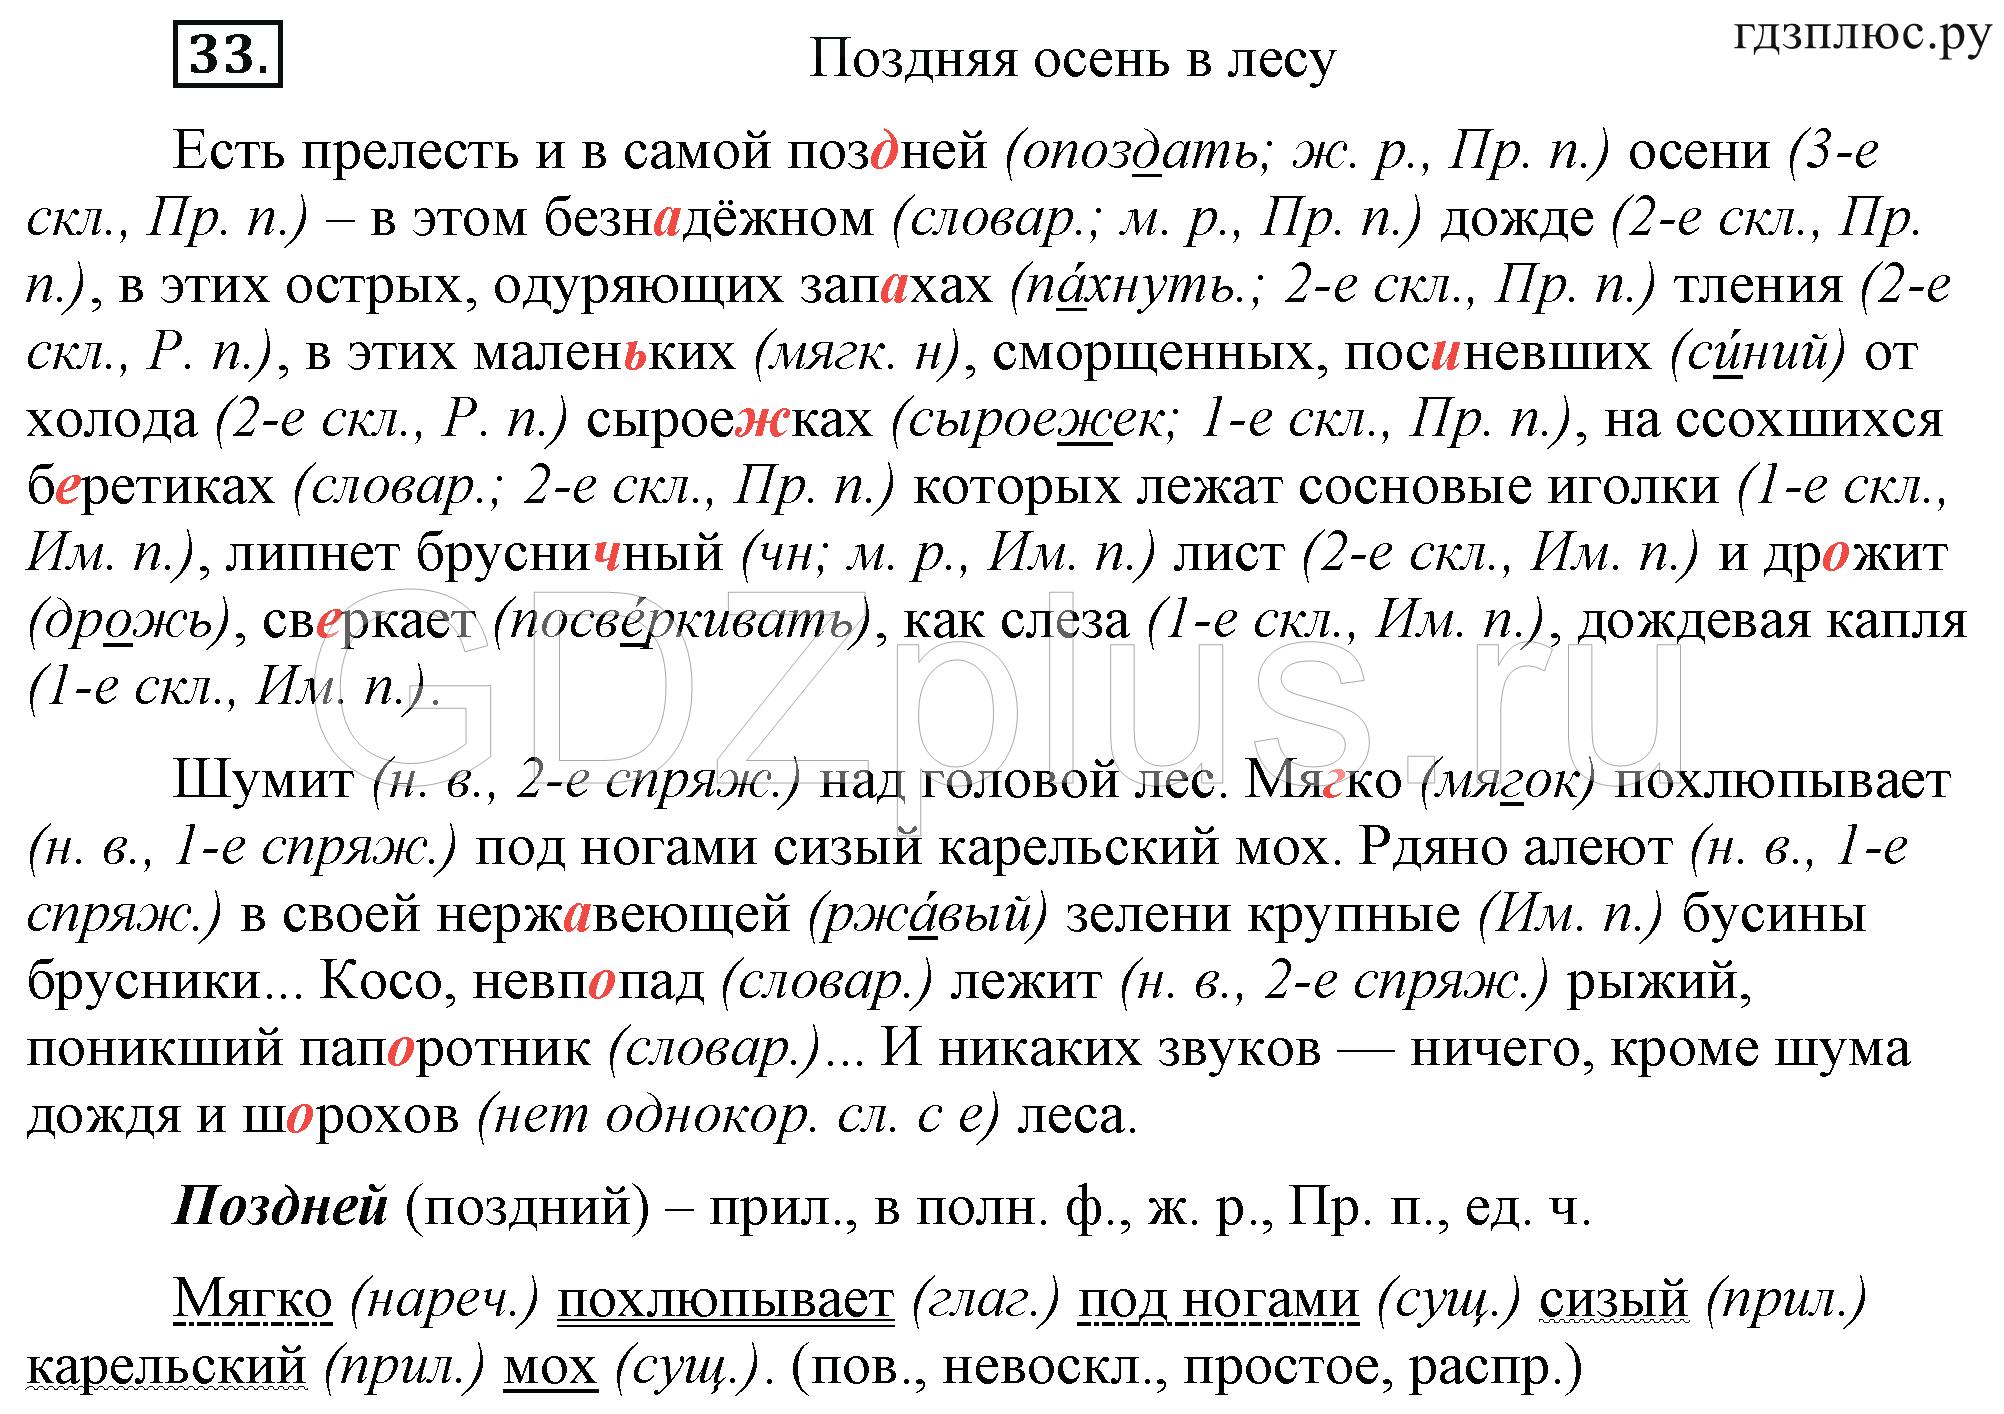 гдз по русскому языку 6 класс ладынежский